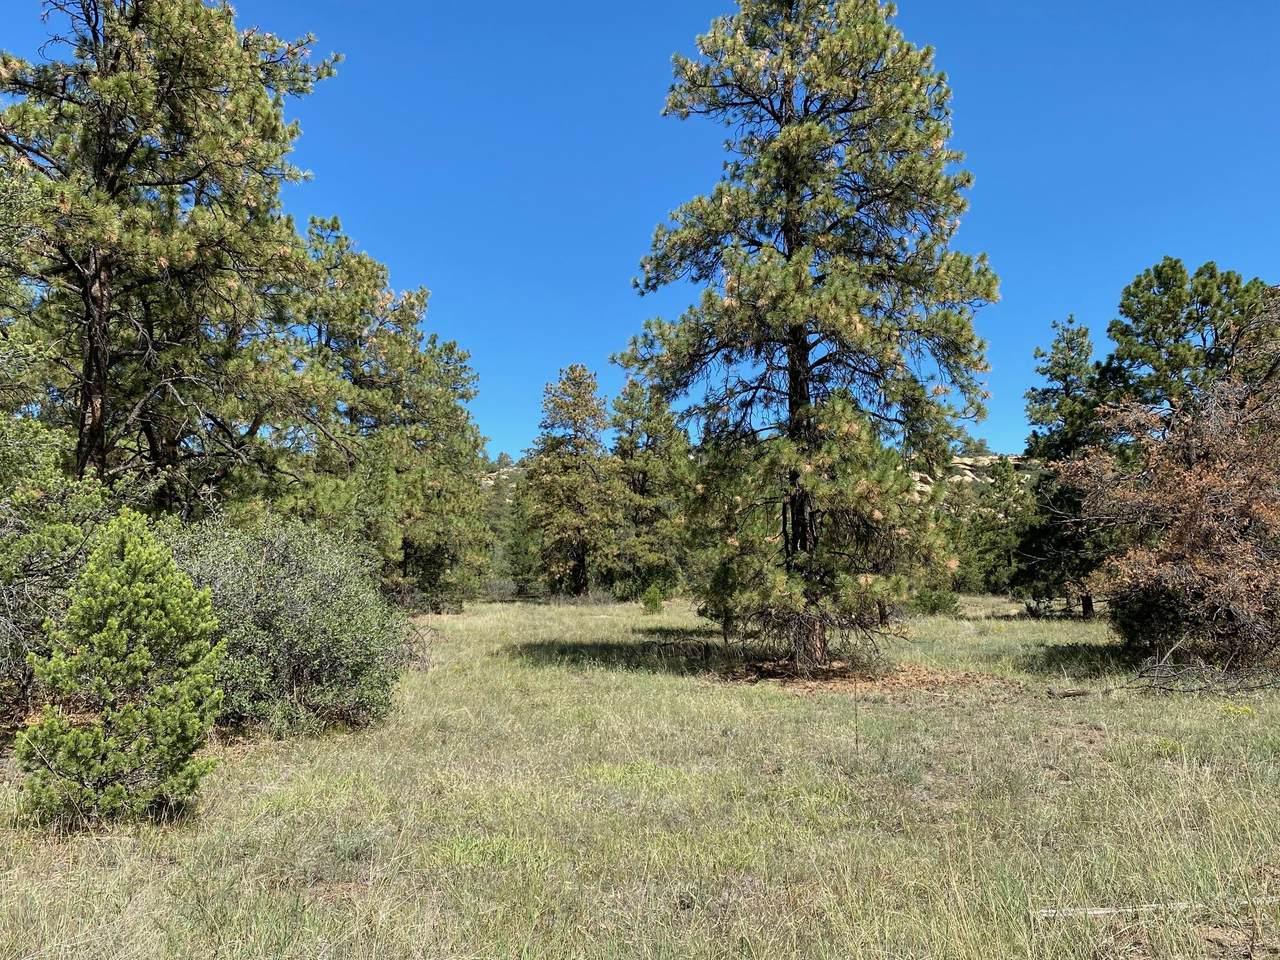 TBD Rancho La Garita Lot 137 - Photo 1